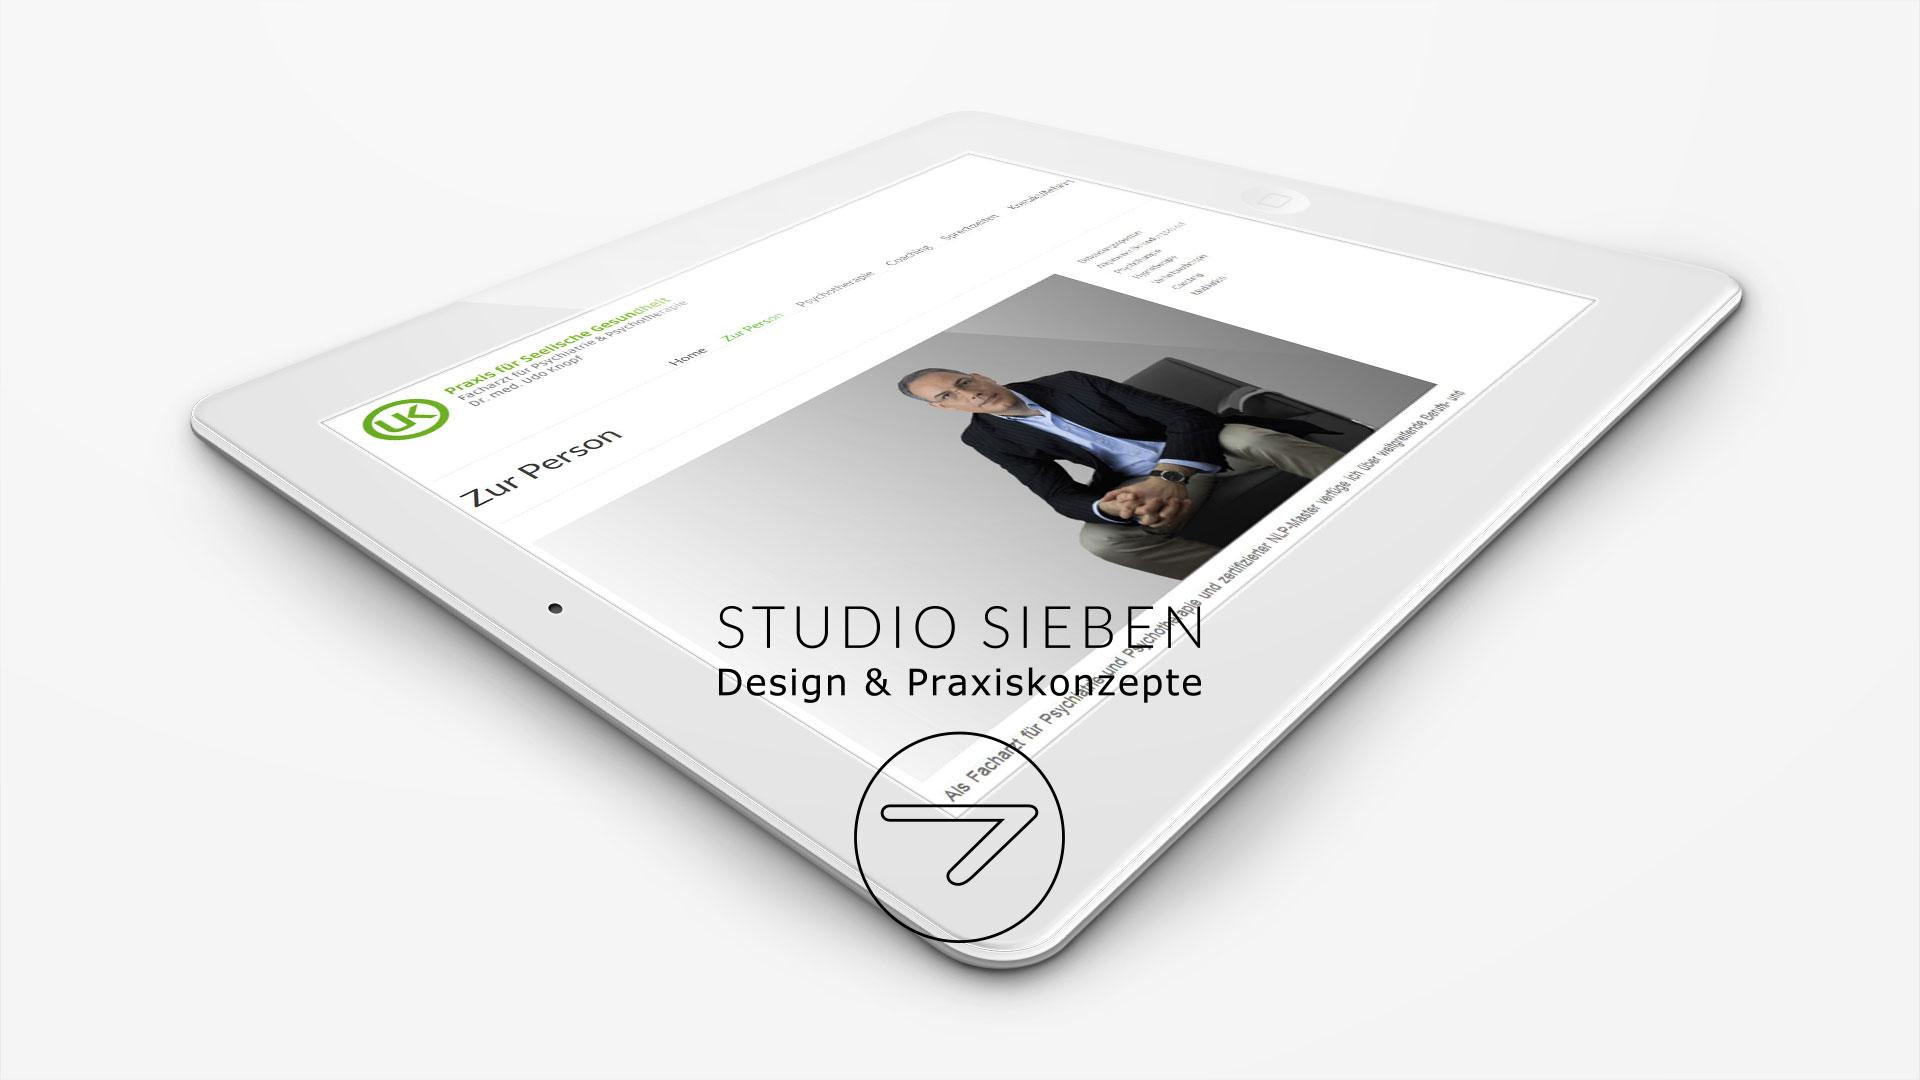 praxis-uk-psychiater-hamburg-webdesign-arzt-beratung